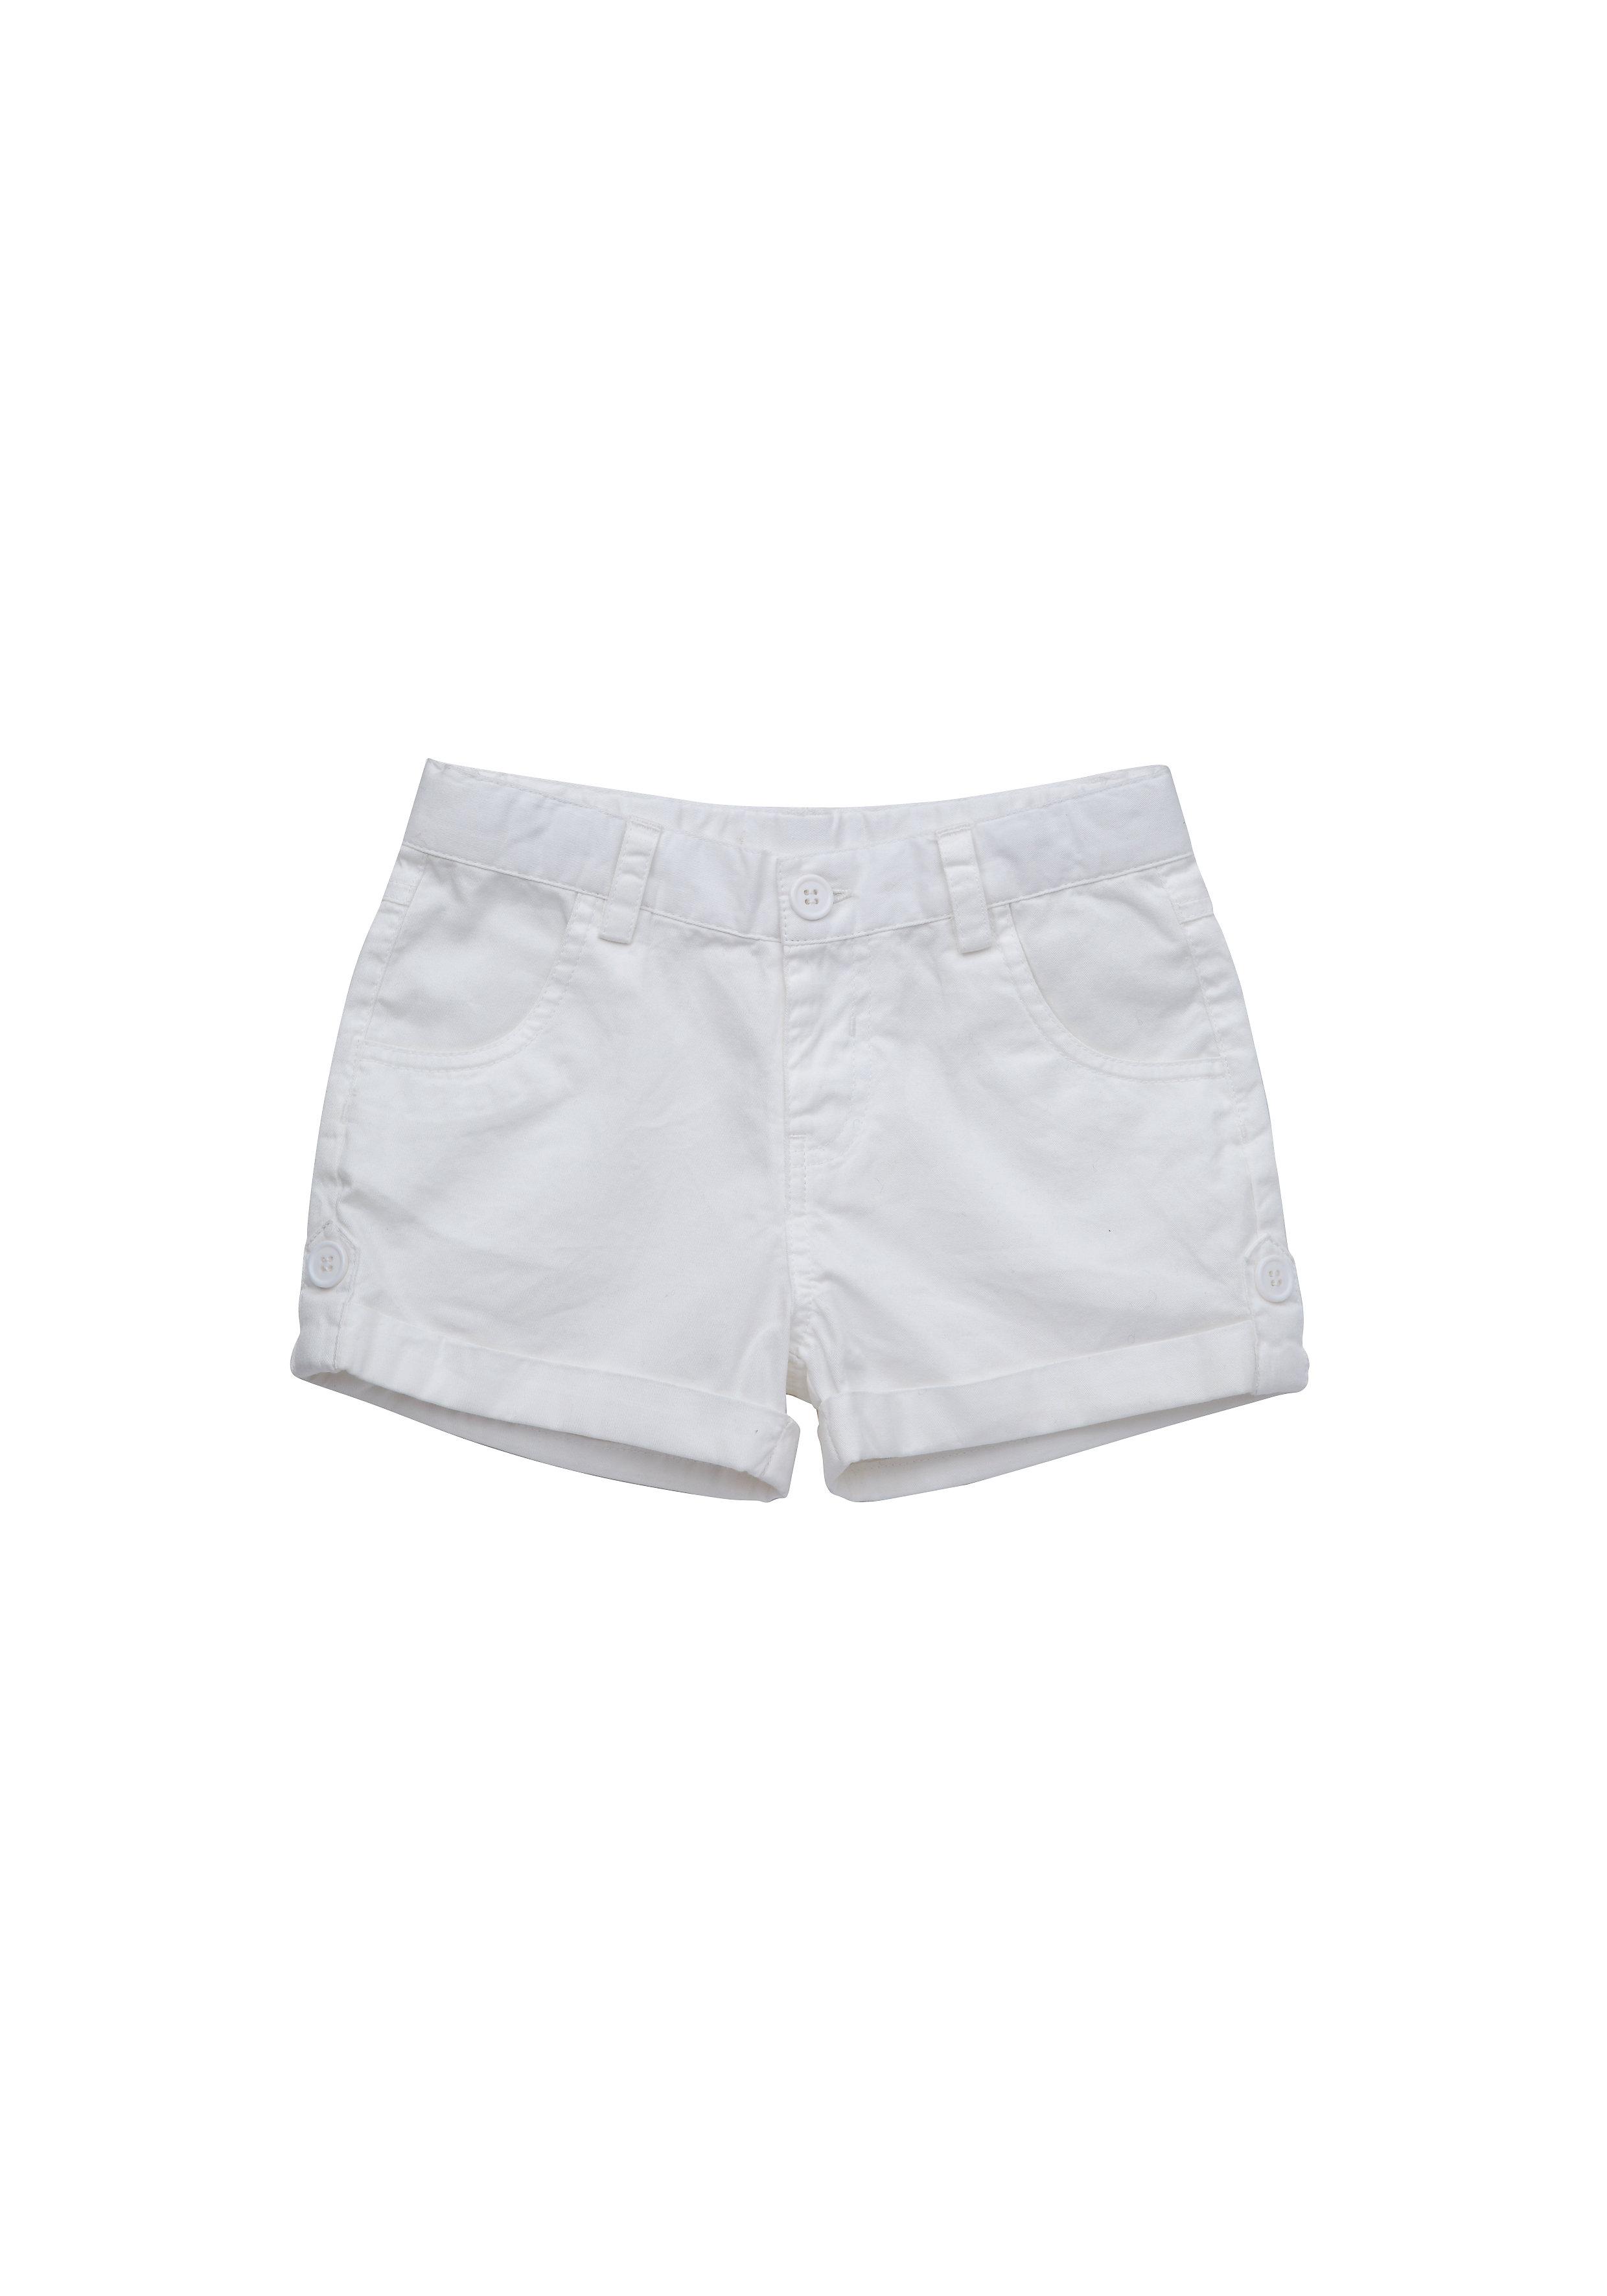 Mothercare | Girls Shorts - White